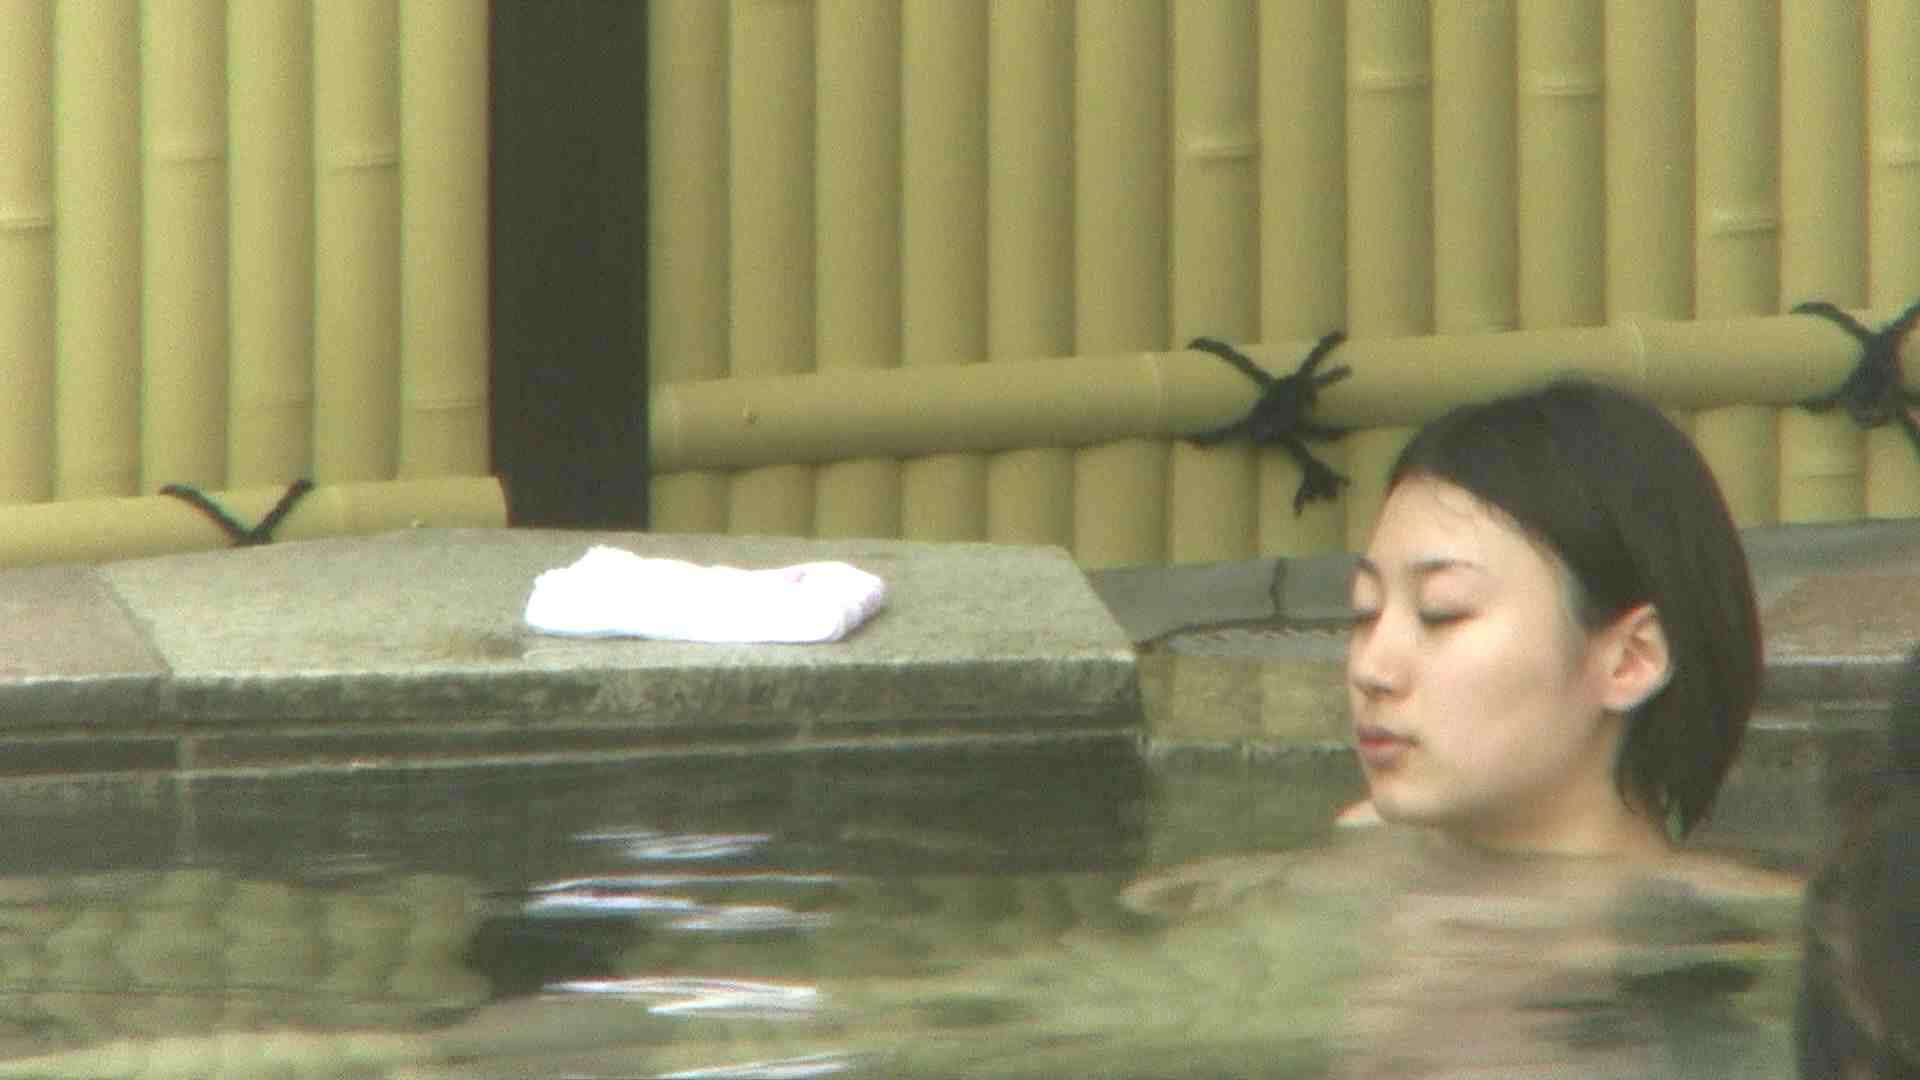 Aquaな露天風呂Vol.123 美しいOLの裸体 | 露天風呂突入  105pic 1